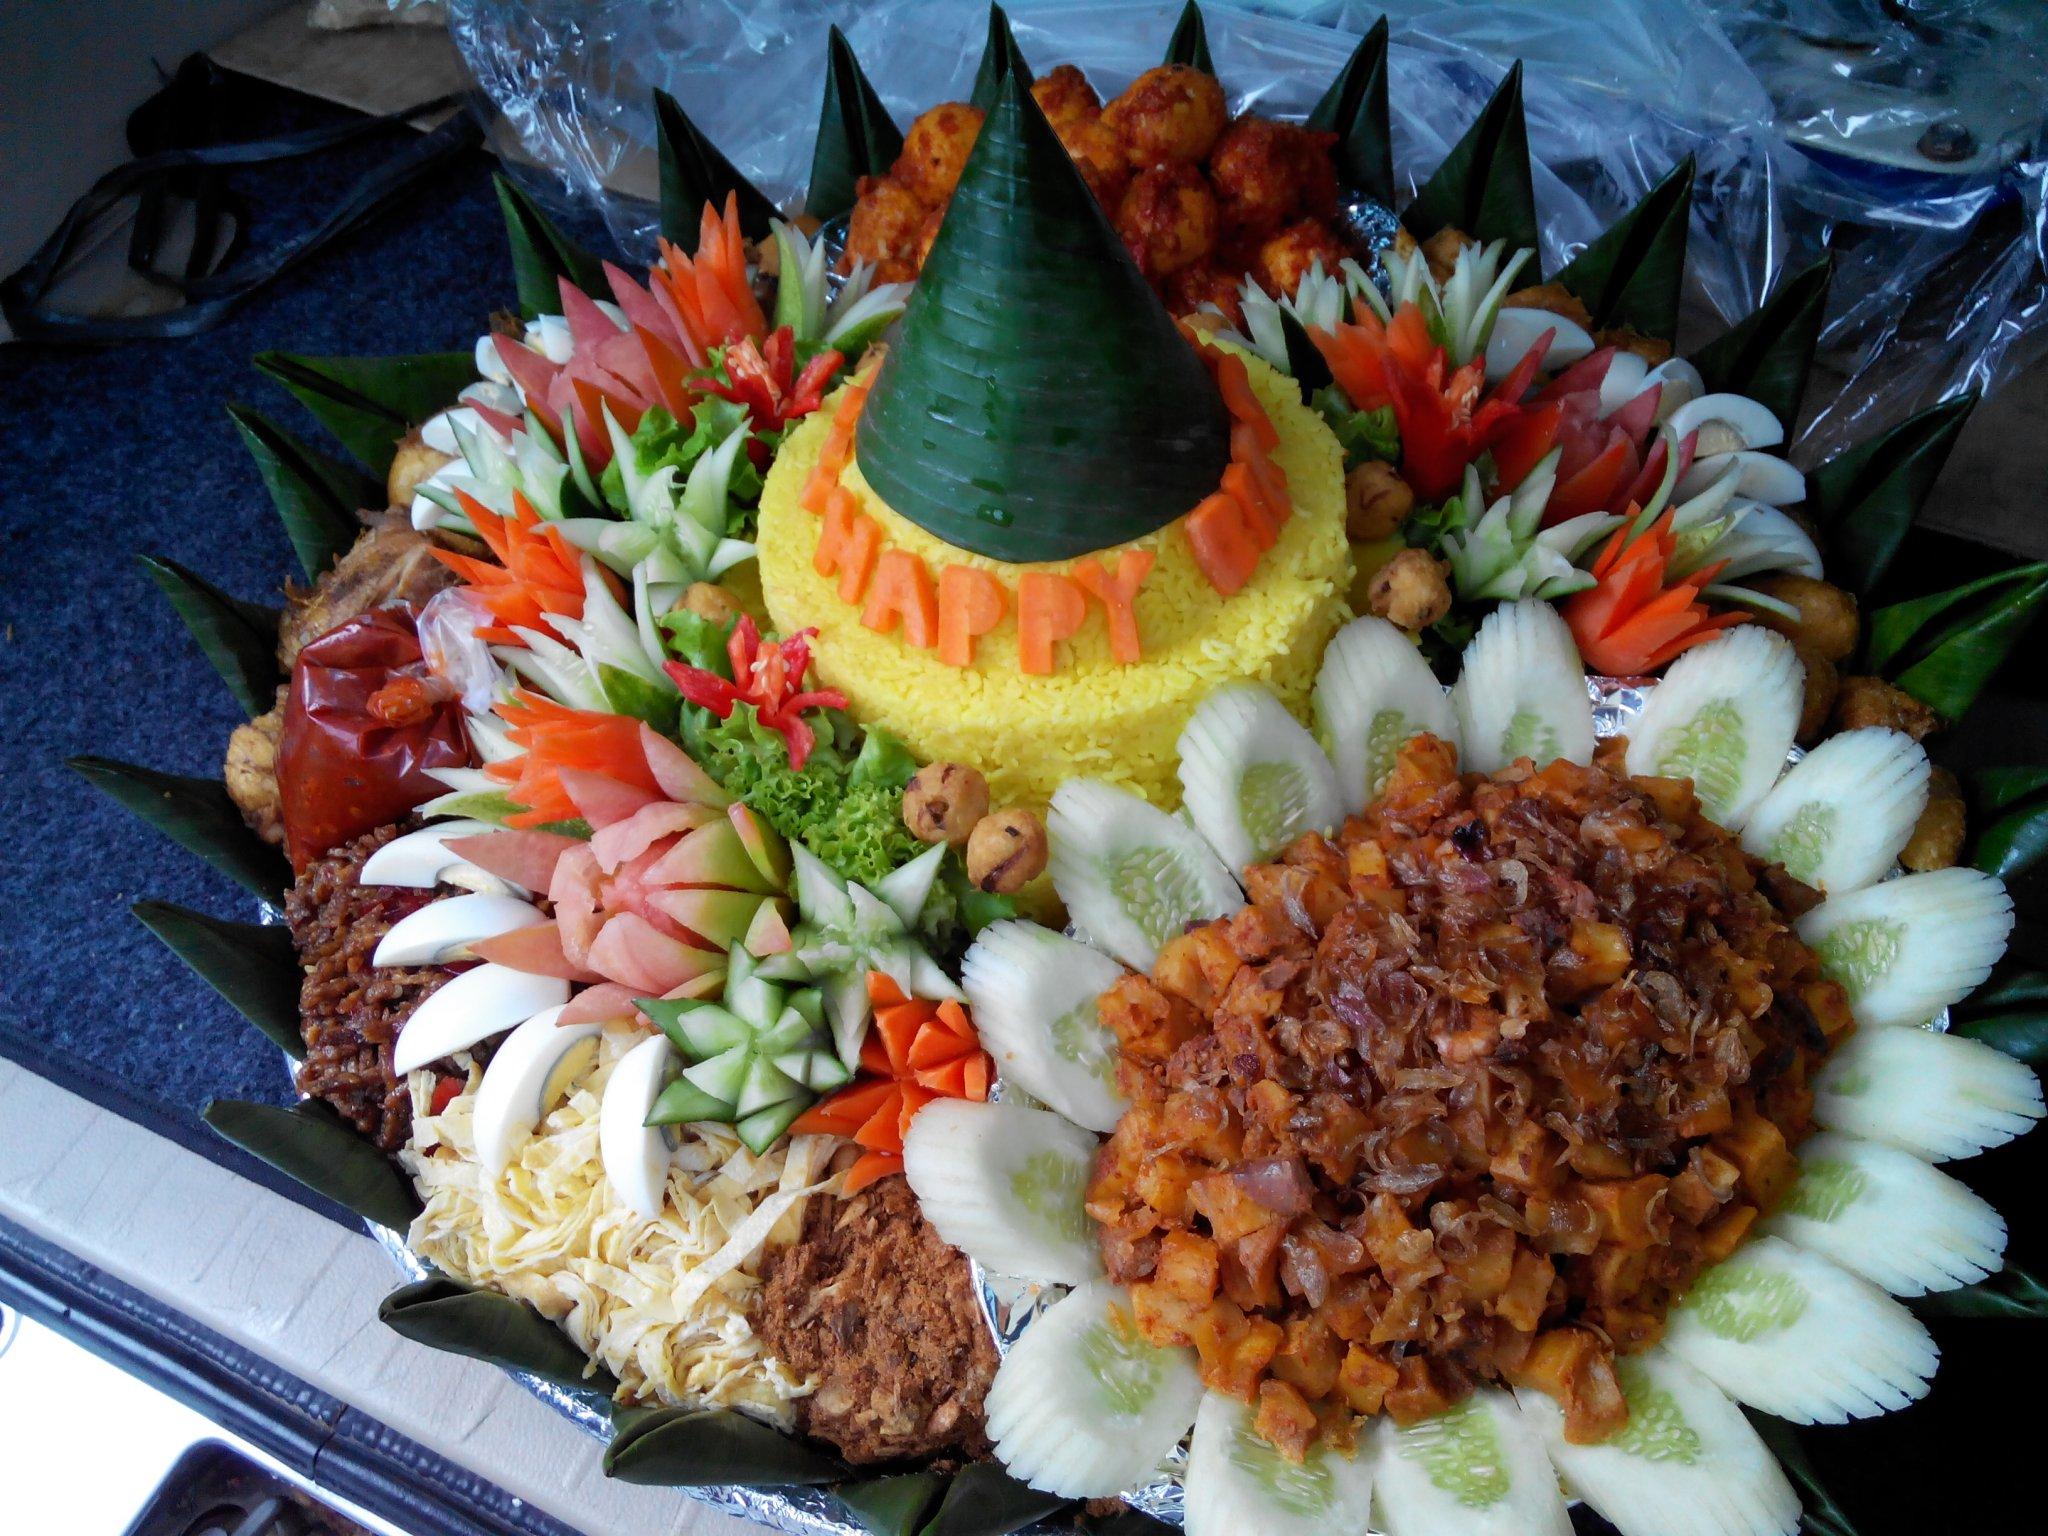 Pesanan Nasi Tumpeng Ibu Novita di Cempaka Putih, Jakarta Pusat